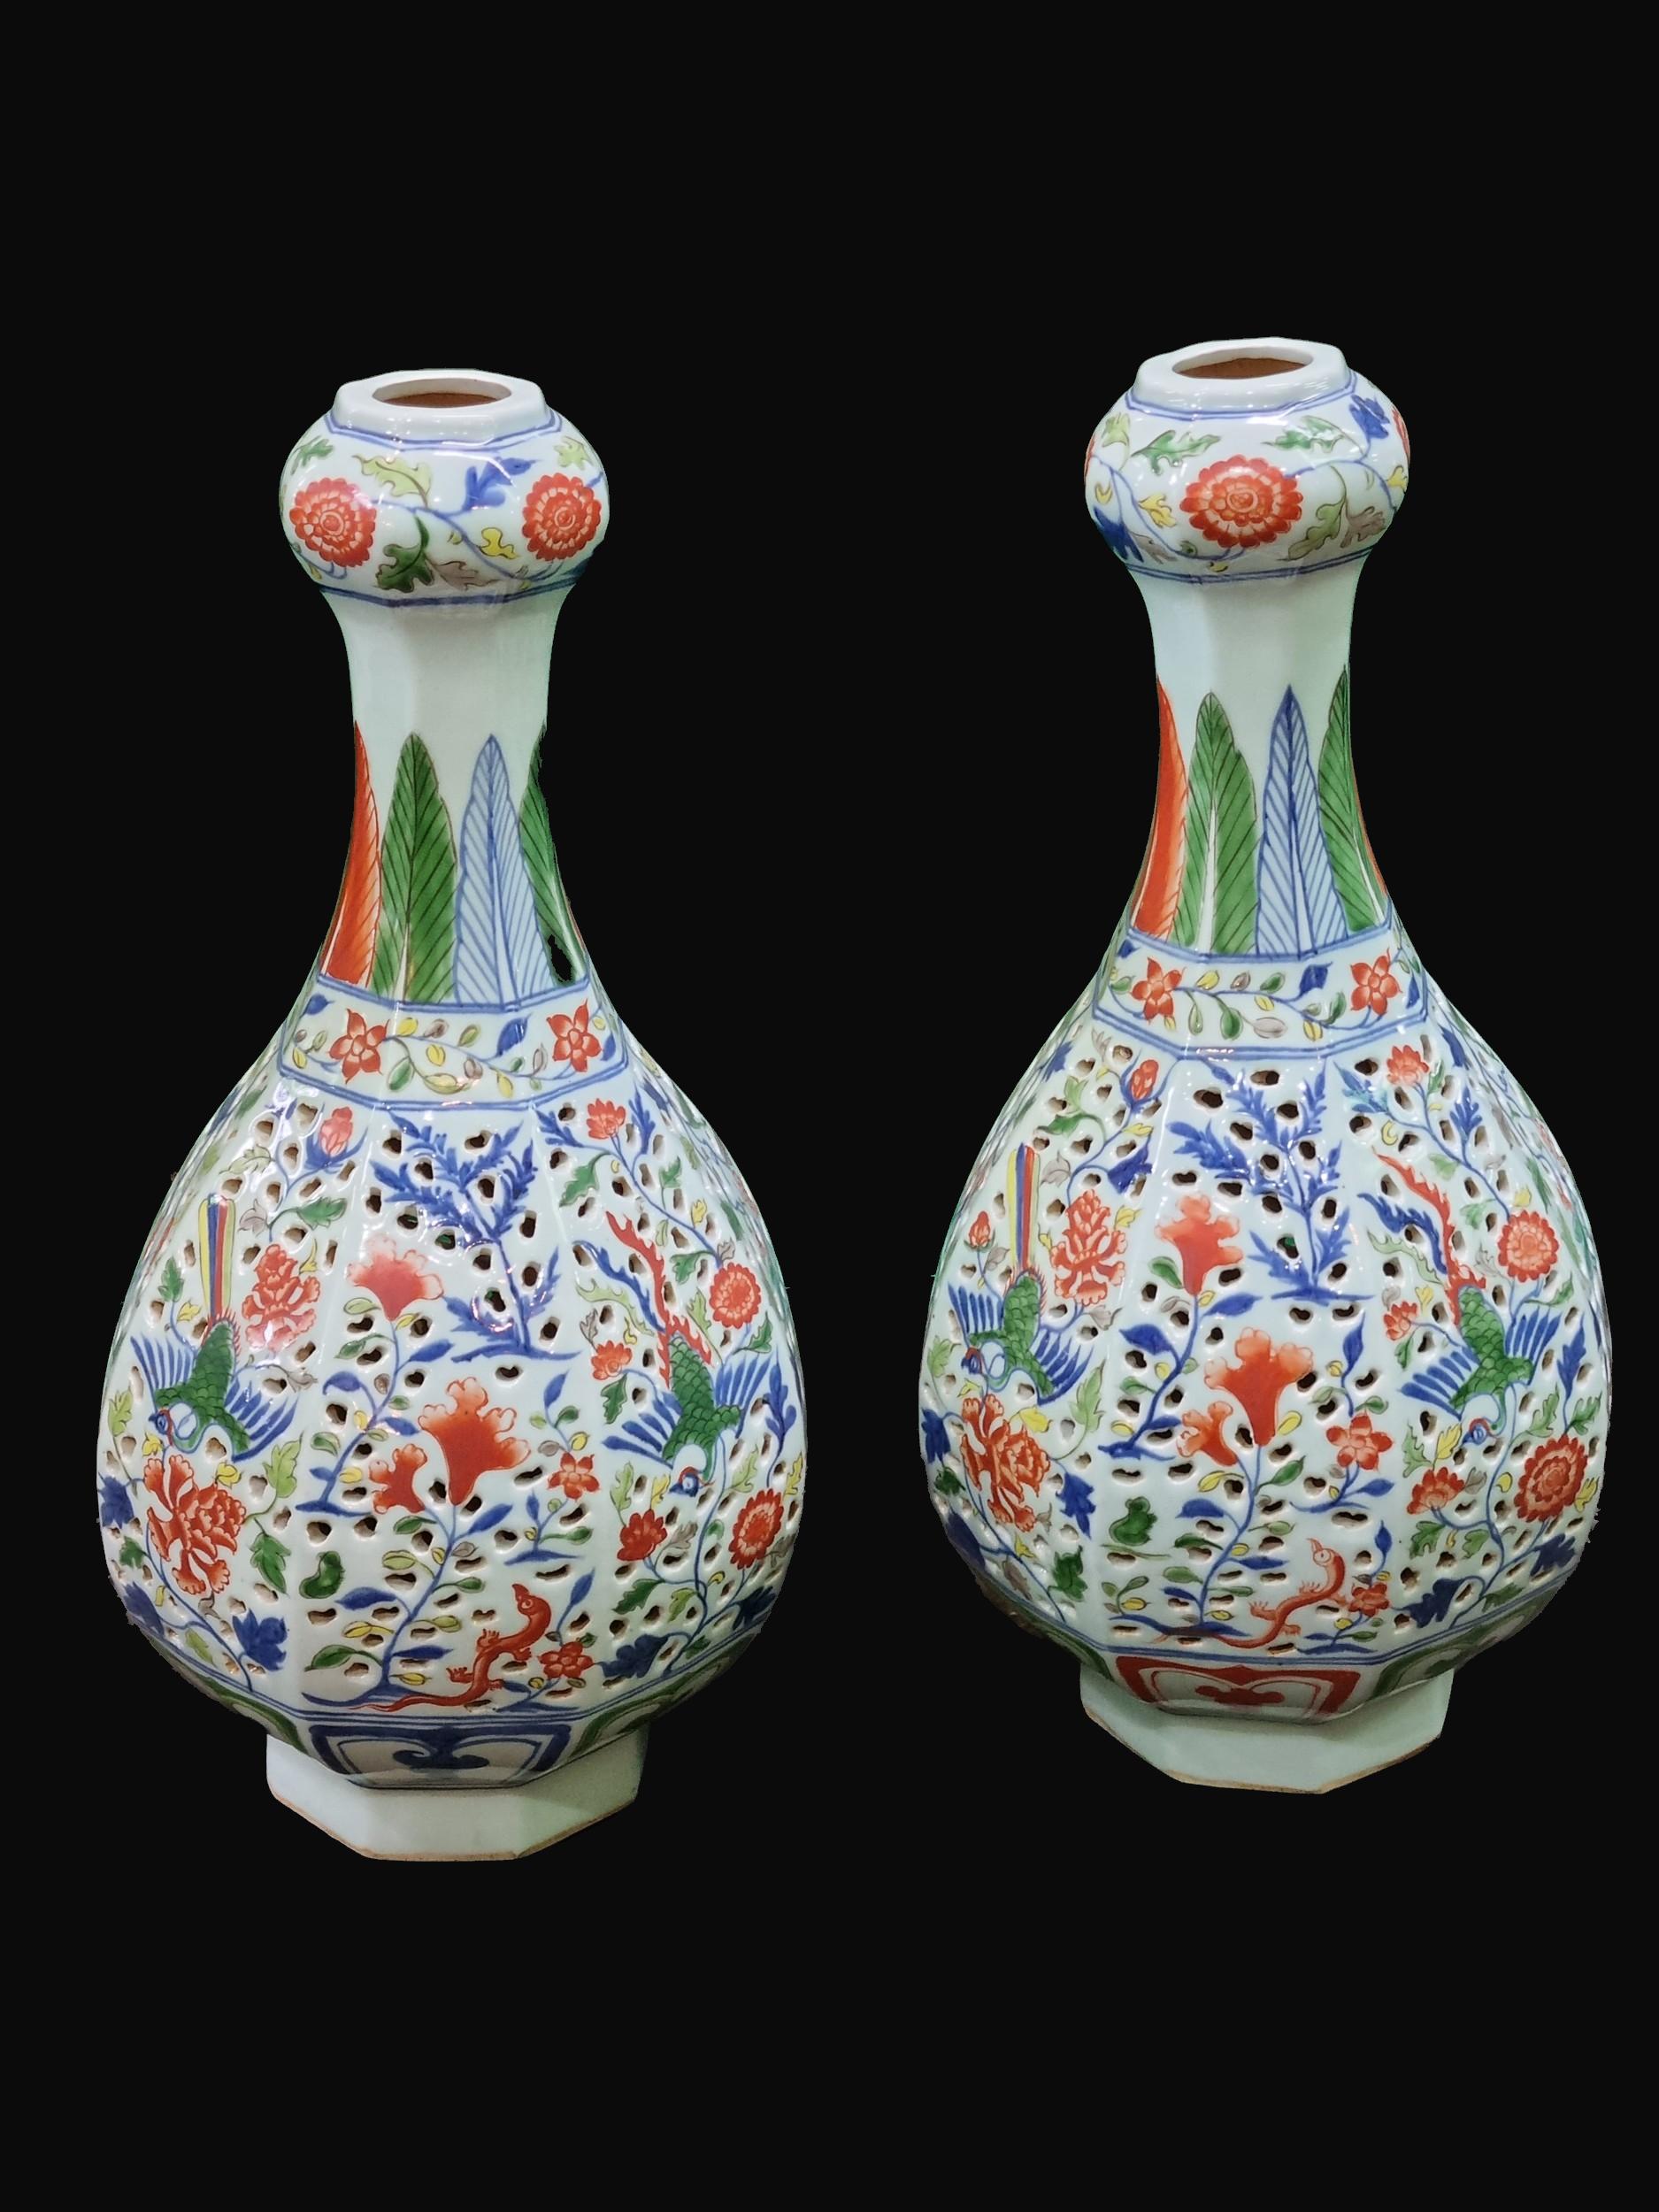 Decorative Pair of C20th Chinese Vases